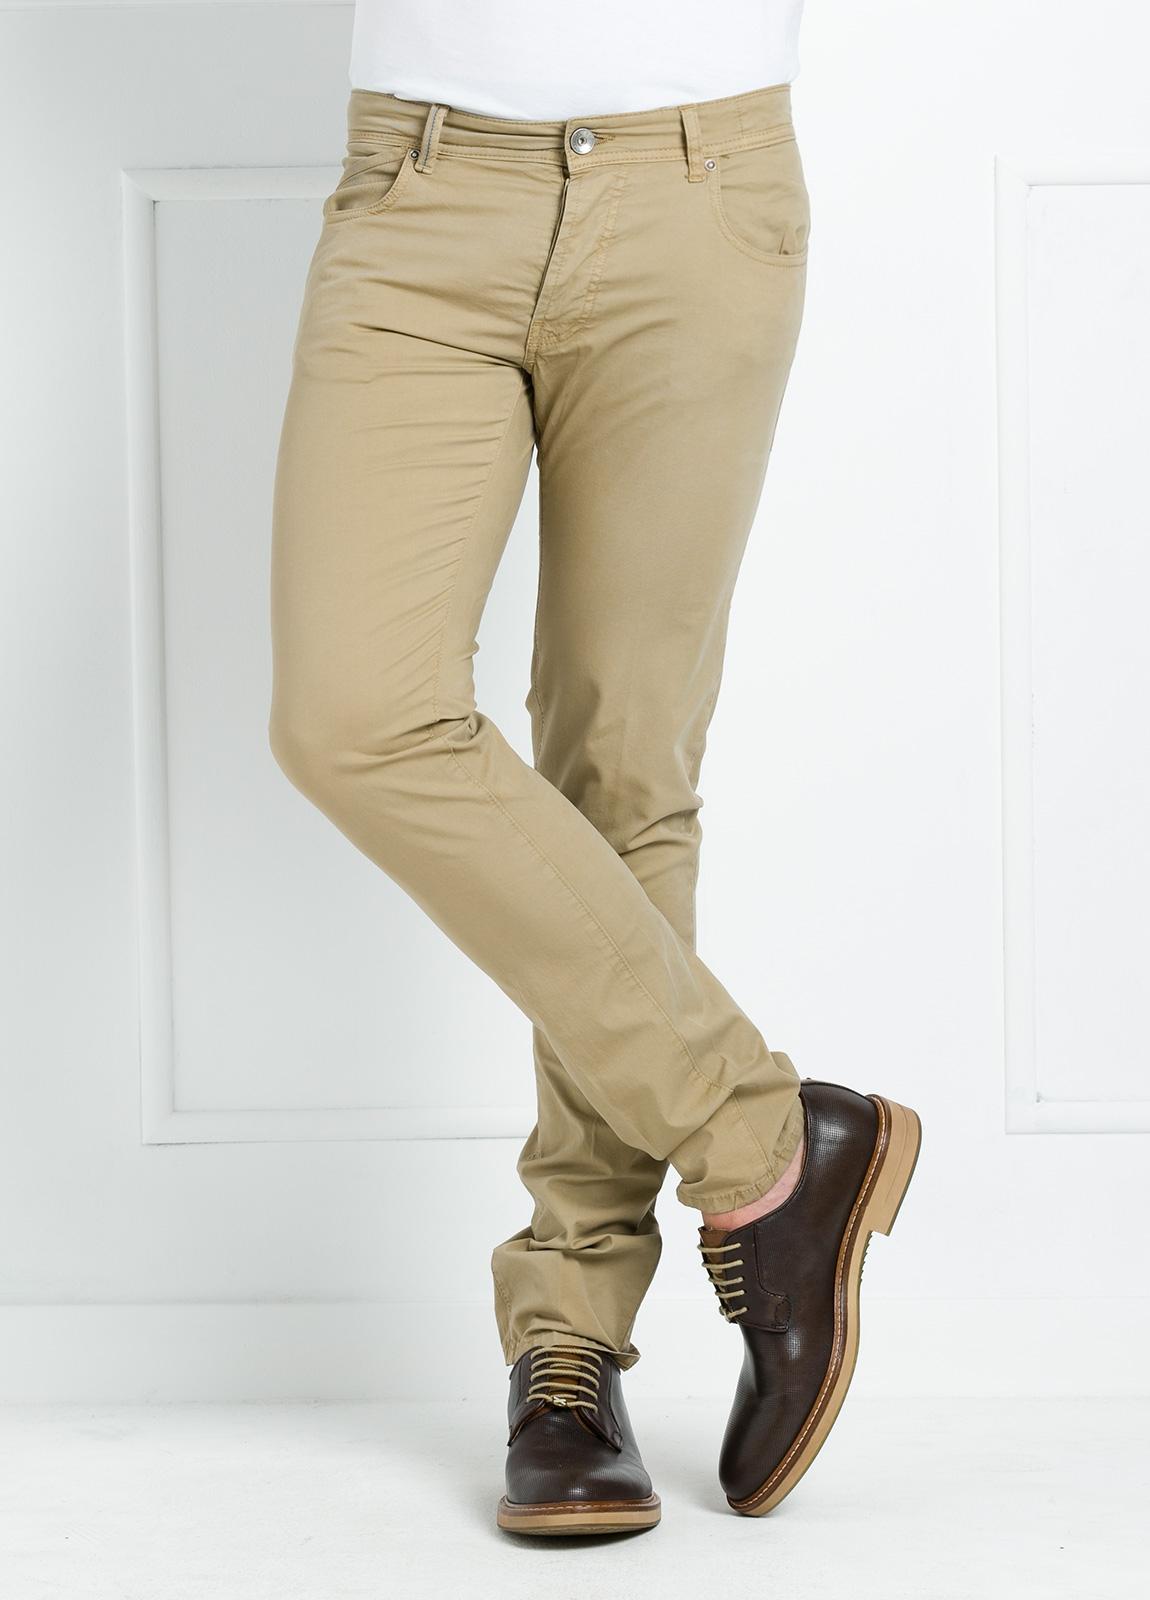 Pantalón sport regular fit modelo POLLOCK P 053 color beige. 96% Algodón gabardina 4% Lycra.